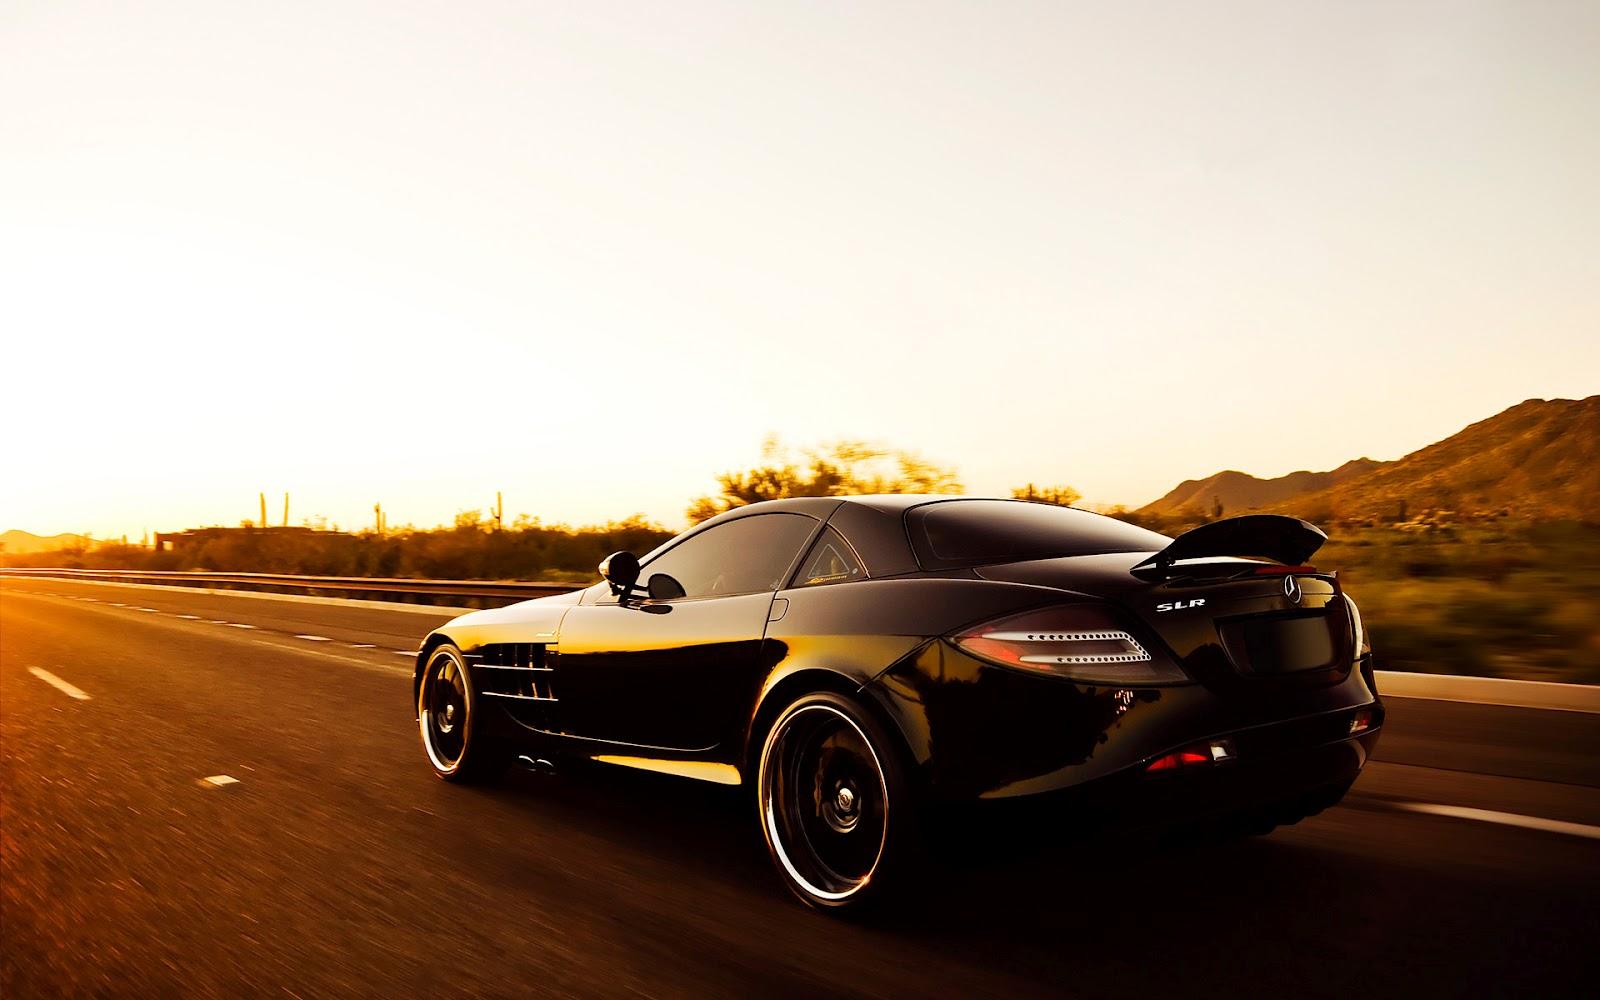 Black Mercedes Benz SLR Sunlights ~ HD Car Wallpapers